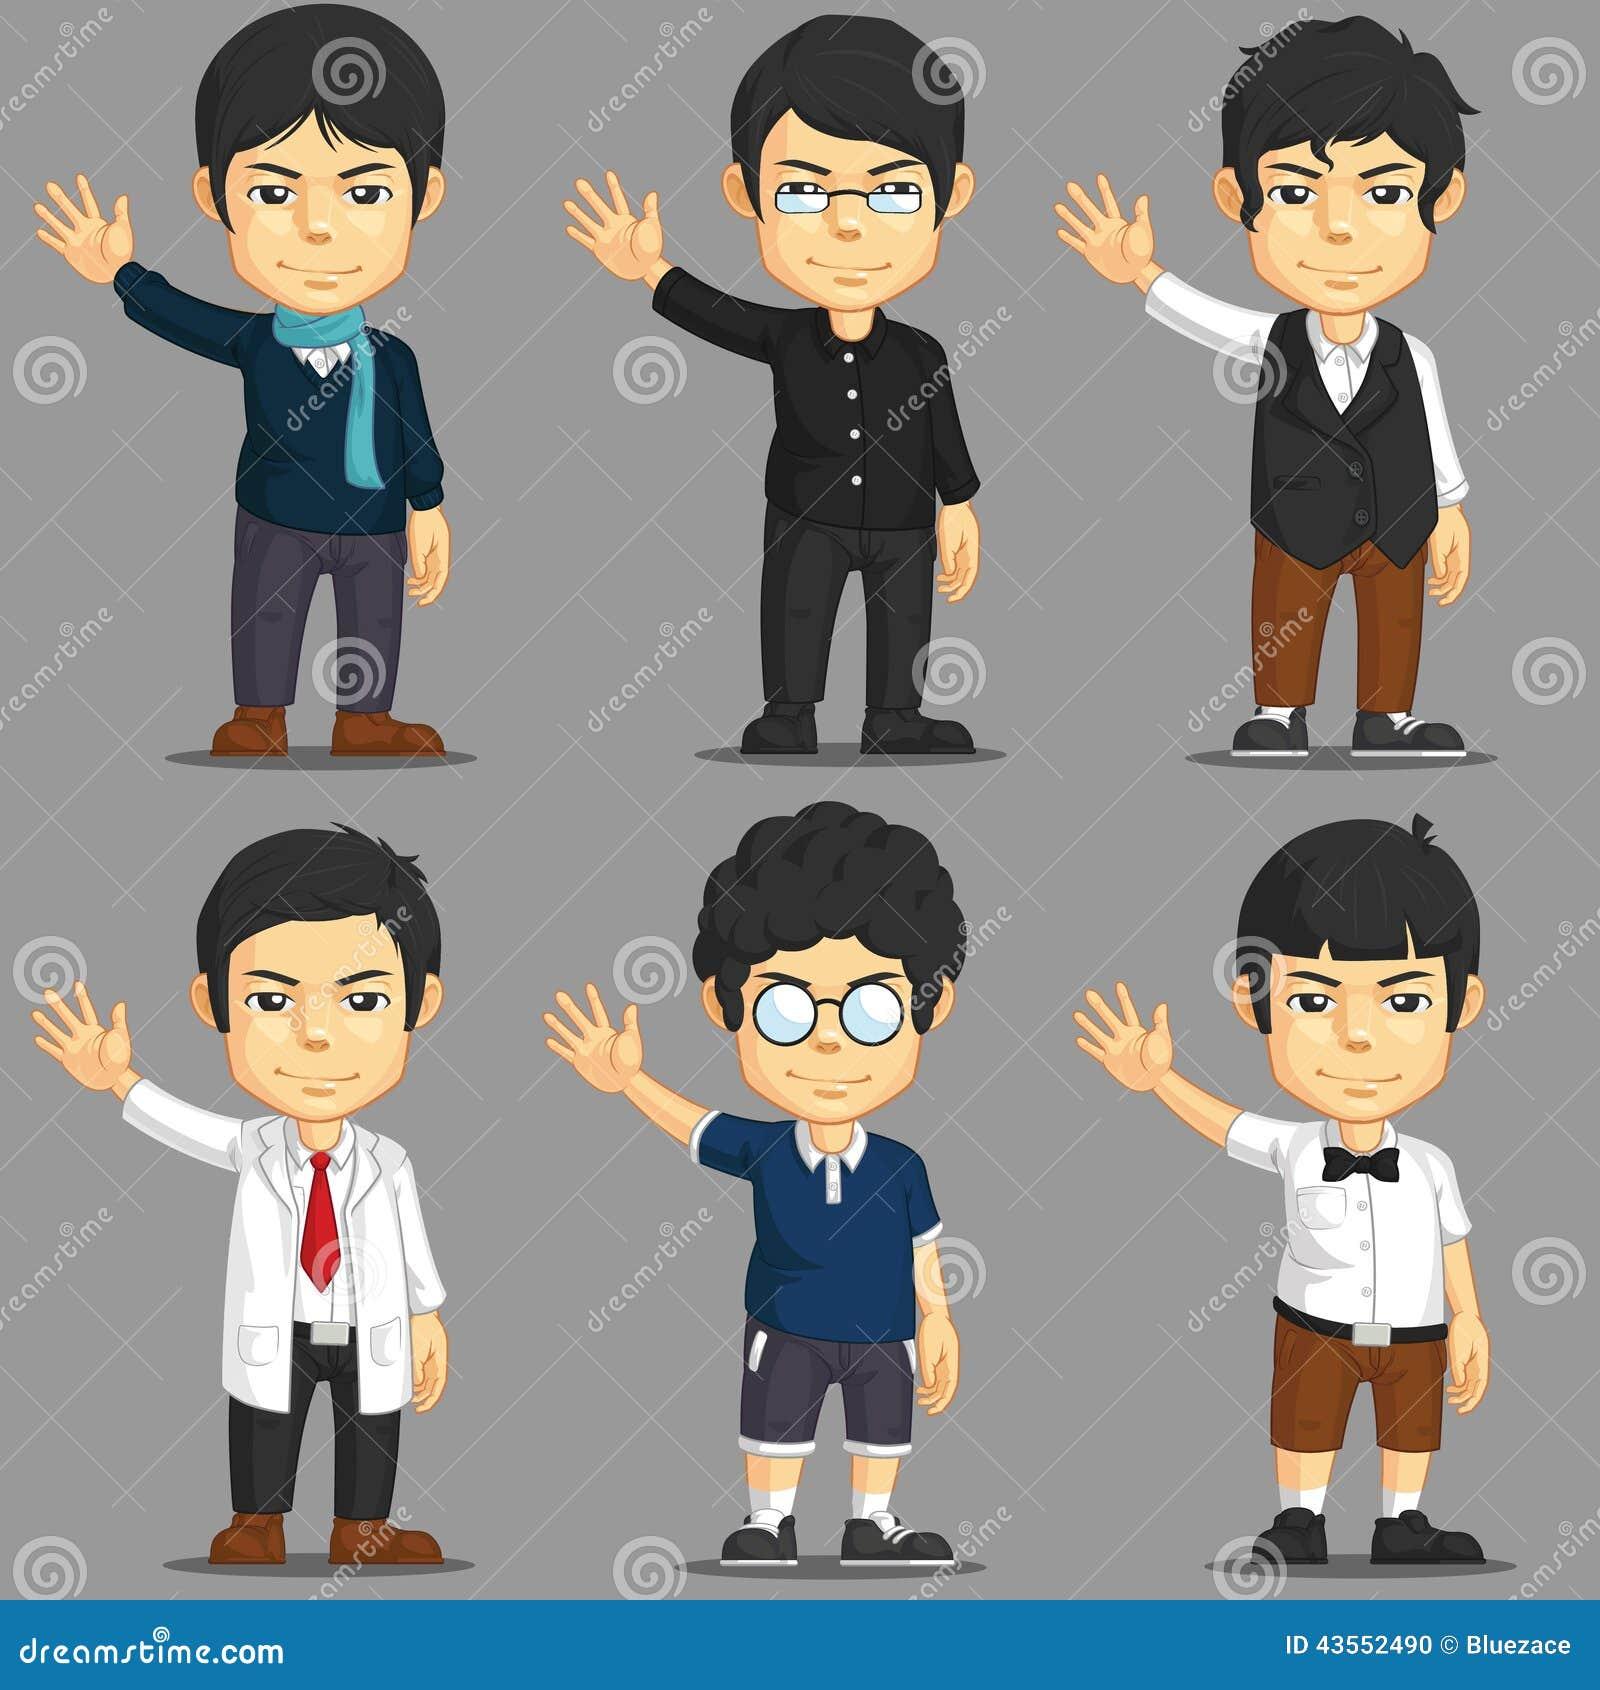 Cartoon Characters Clothes : Man cartoon character set stock vector image